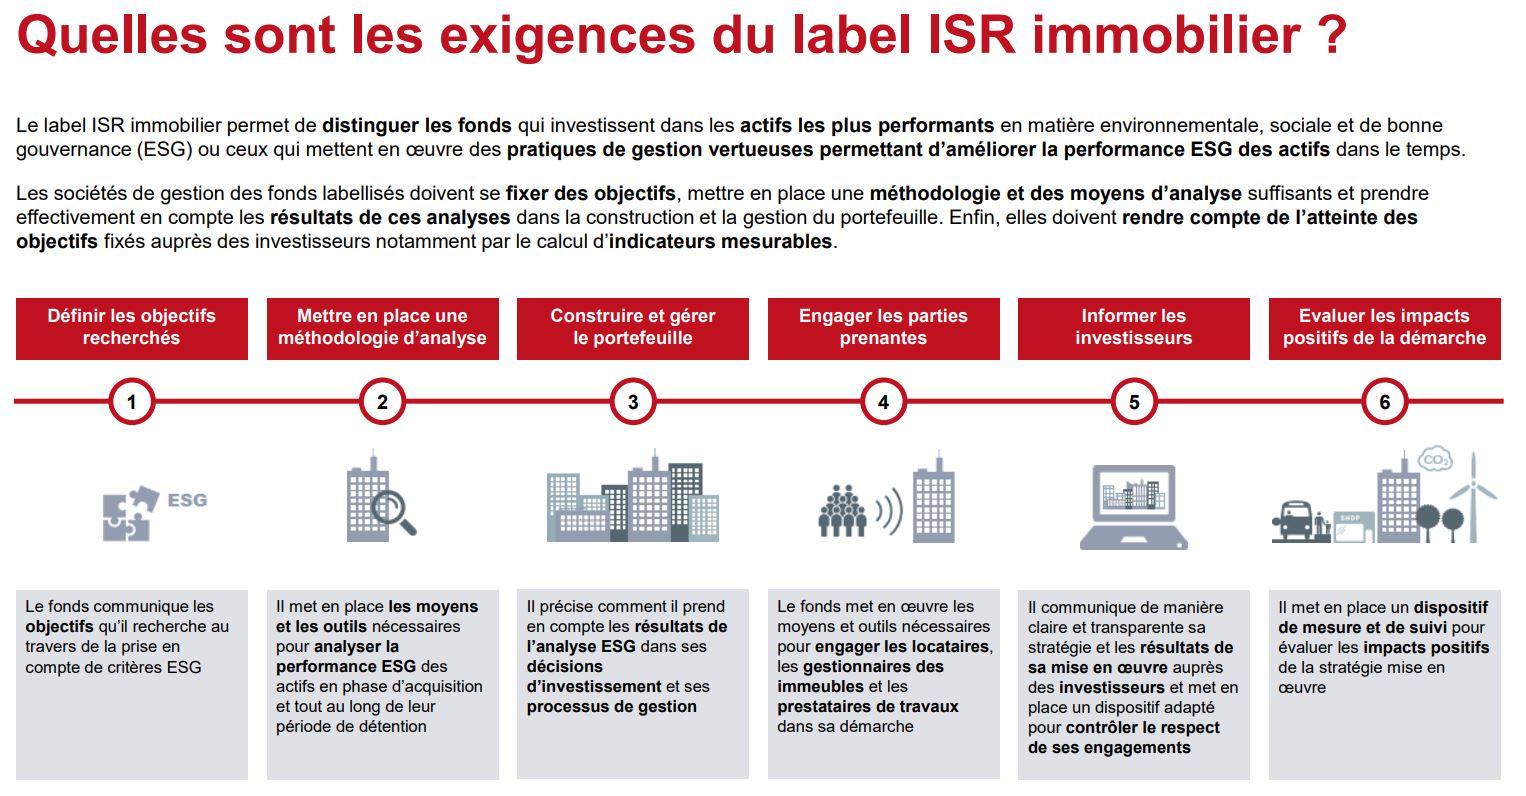 Exigences label ISR